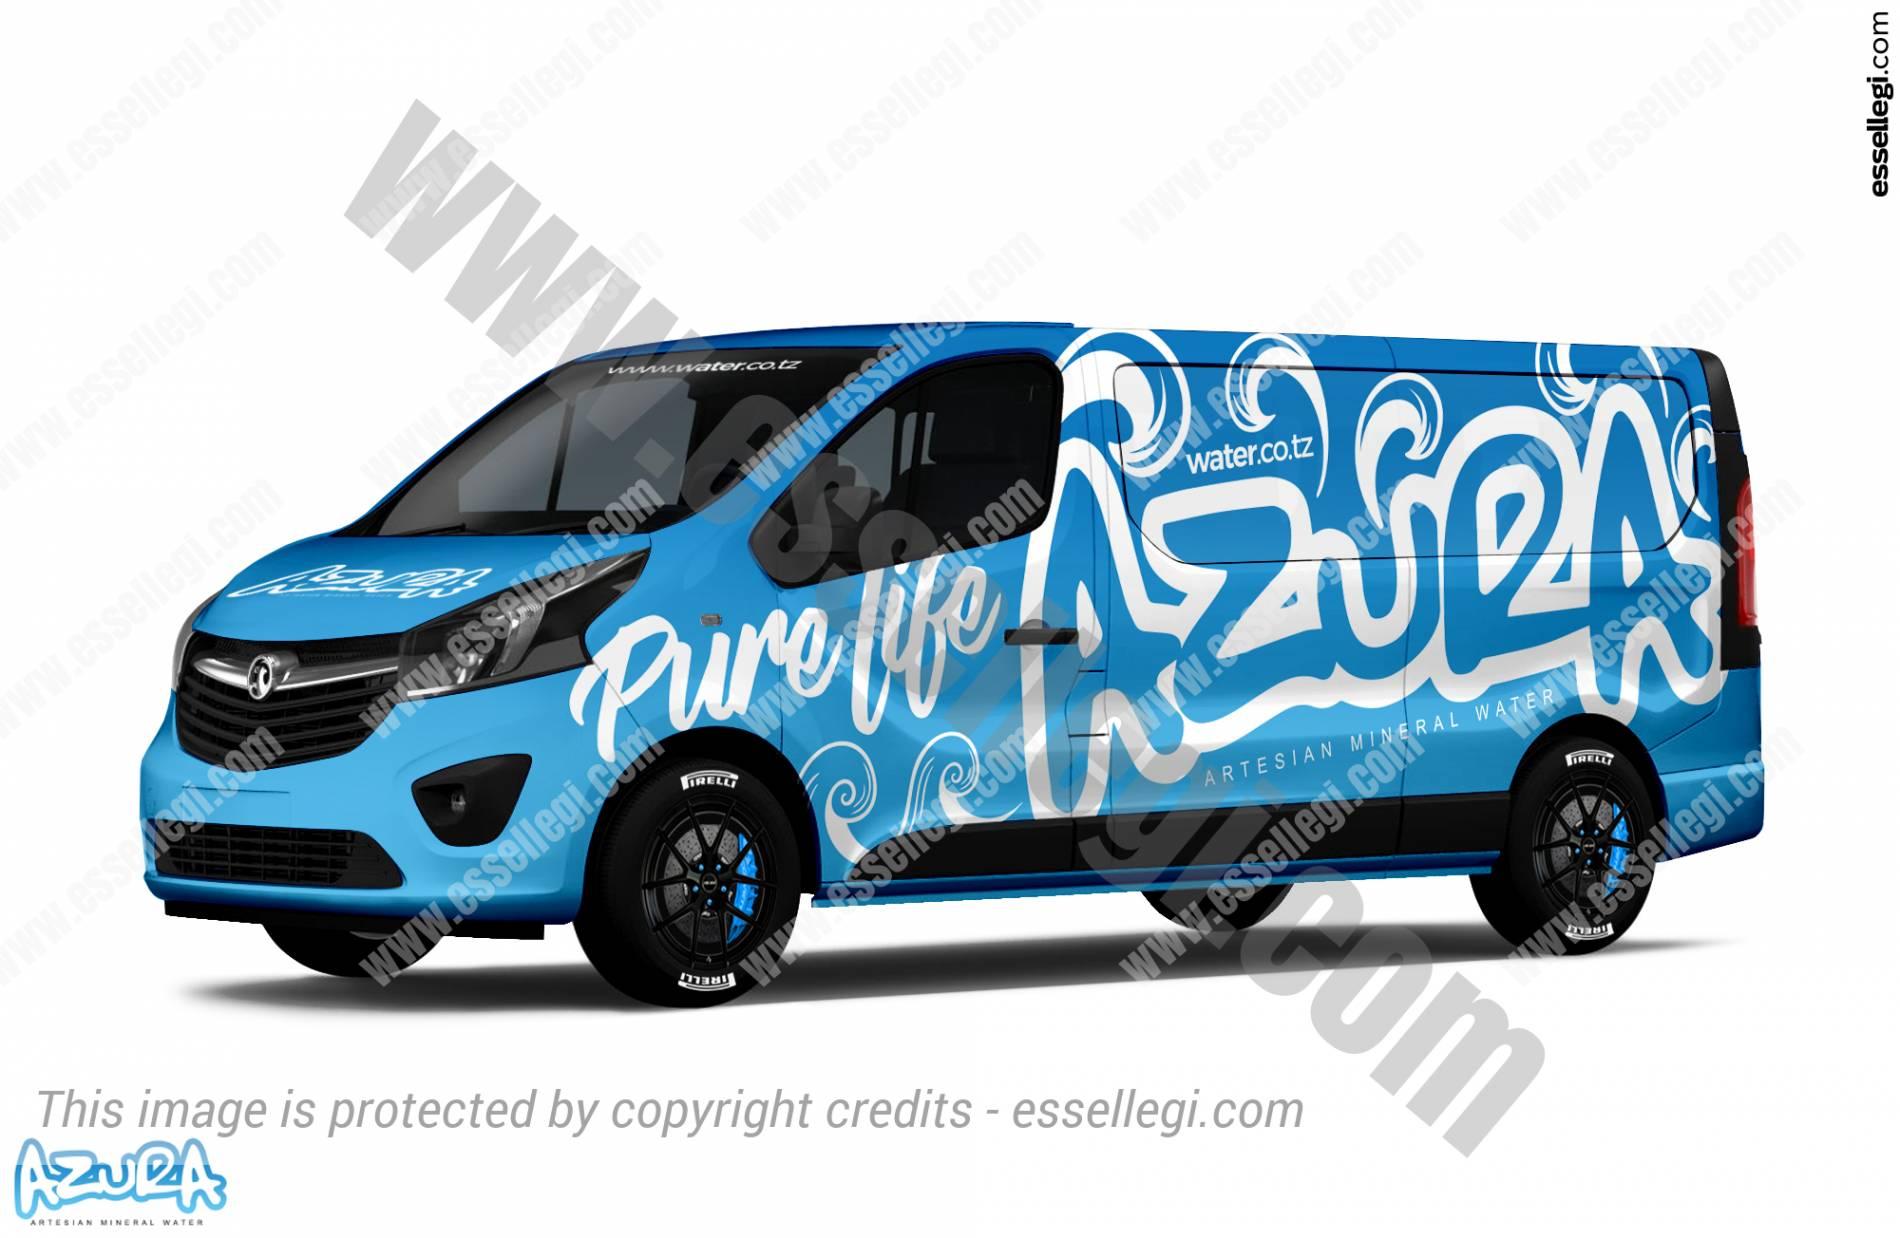 Vauxhall Vivaro Wrap Design. Vauxhall Vivaro | Van Wrap Design by Essellegi. Van Signs, Van Signage, Van Wrapping, Van Signwriting, Van Wrap Designer, Signs for Van, Van Logo, Van Graphic by Essellegi.